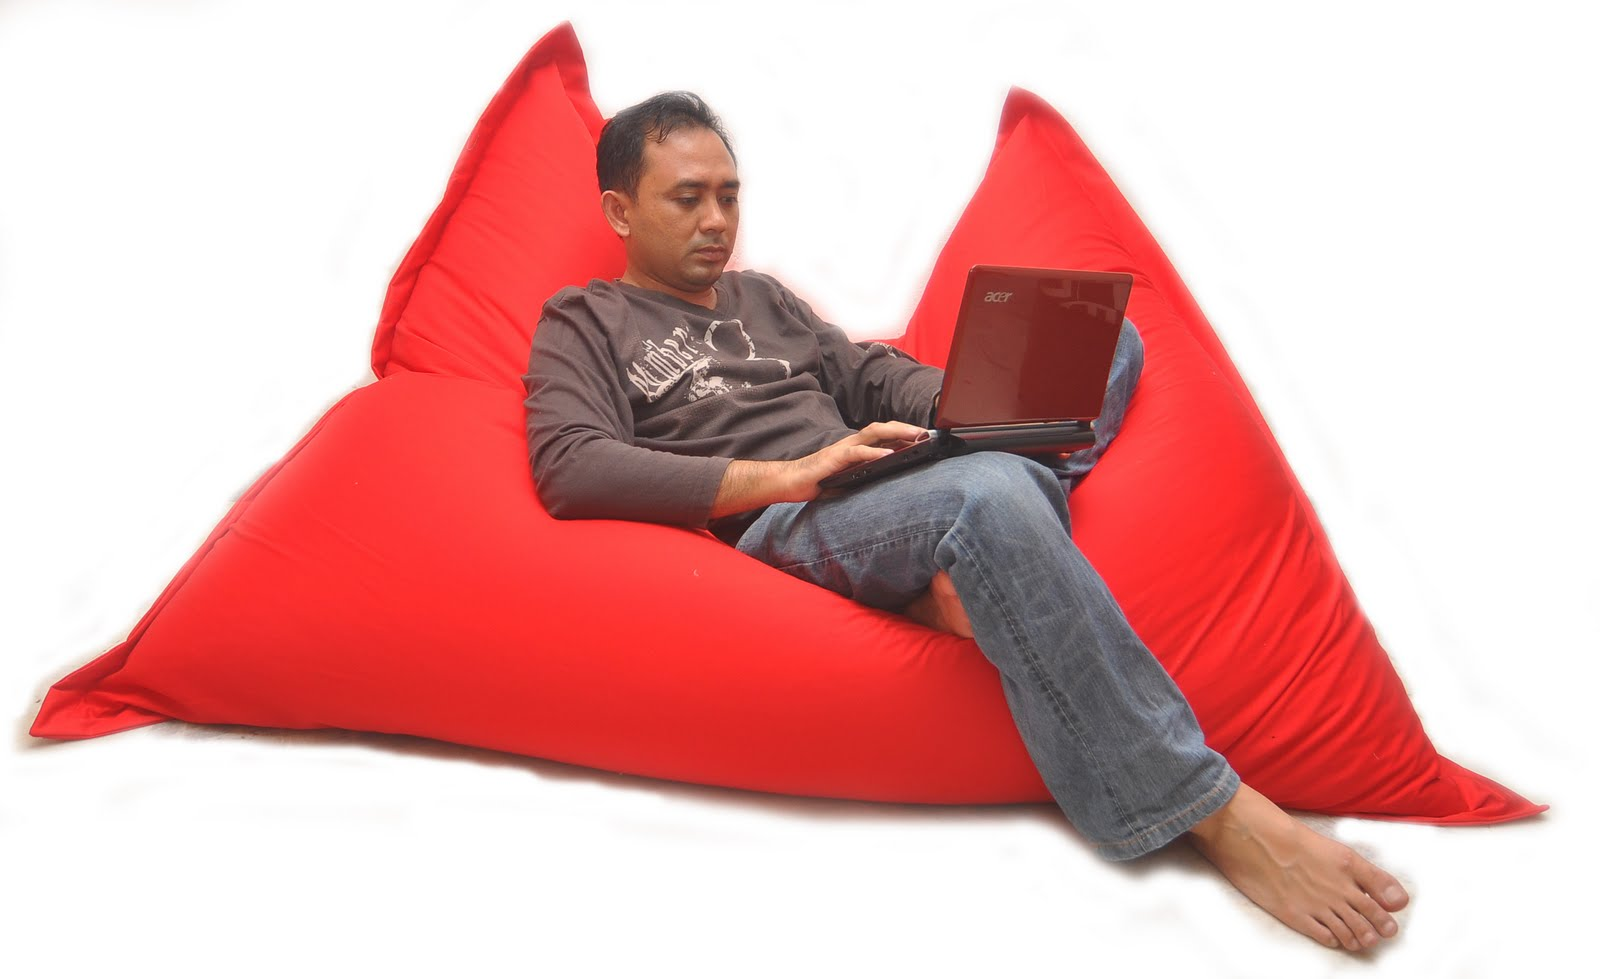 custom bean bag chairs canada best executive chair beanbag montreal  a paradise allsales ca blog